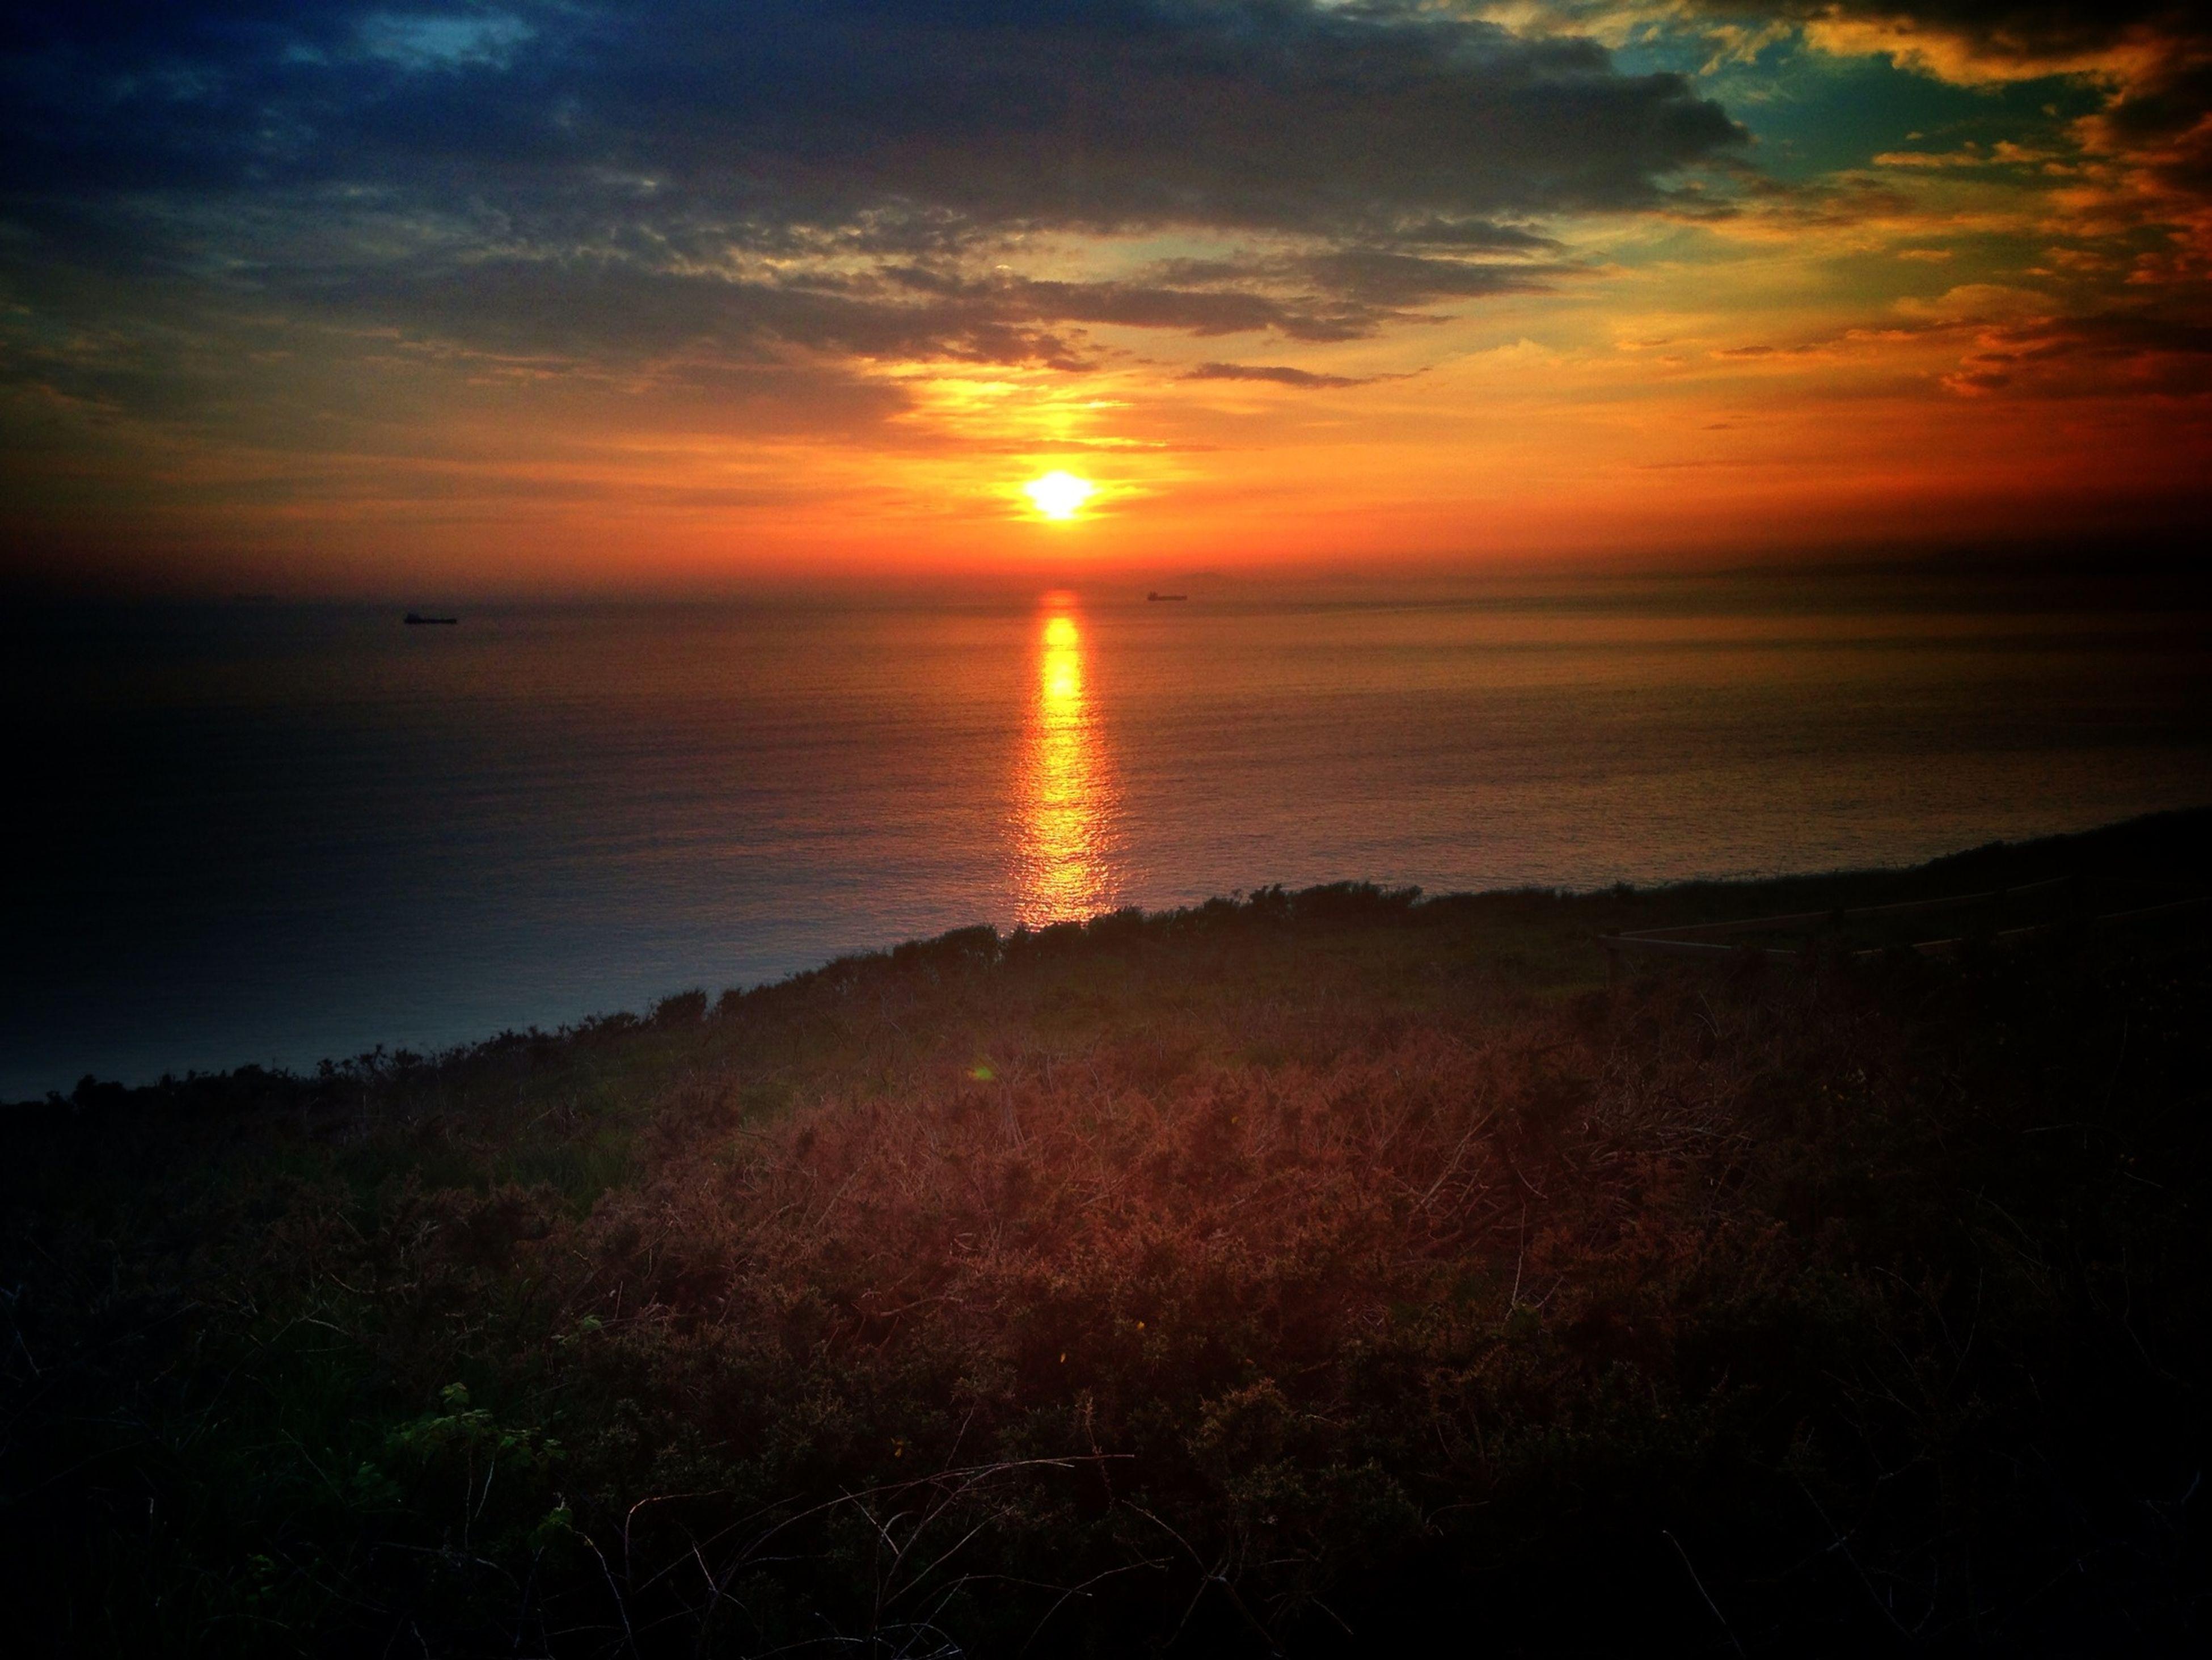 sunset, horizon over water, sea, sun, tranquil scene, scenics, beauty in nature, tranquility, water, sky, orange color, idyllic, nature, beach, cloud - sky, shore, reflection, sunlight, cloud, dramatic sky